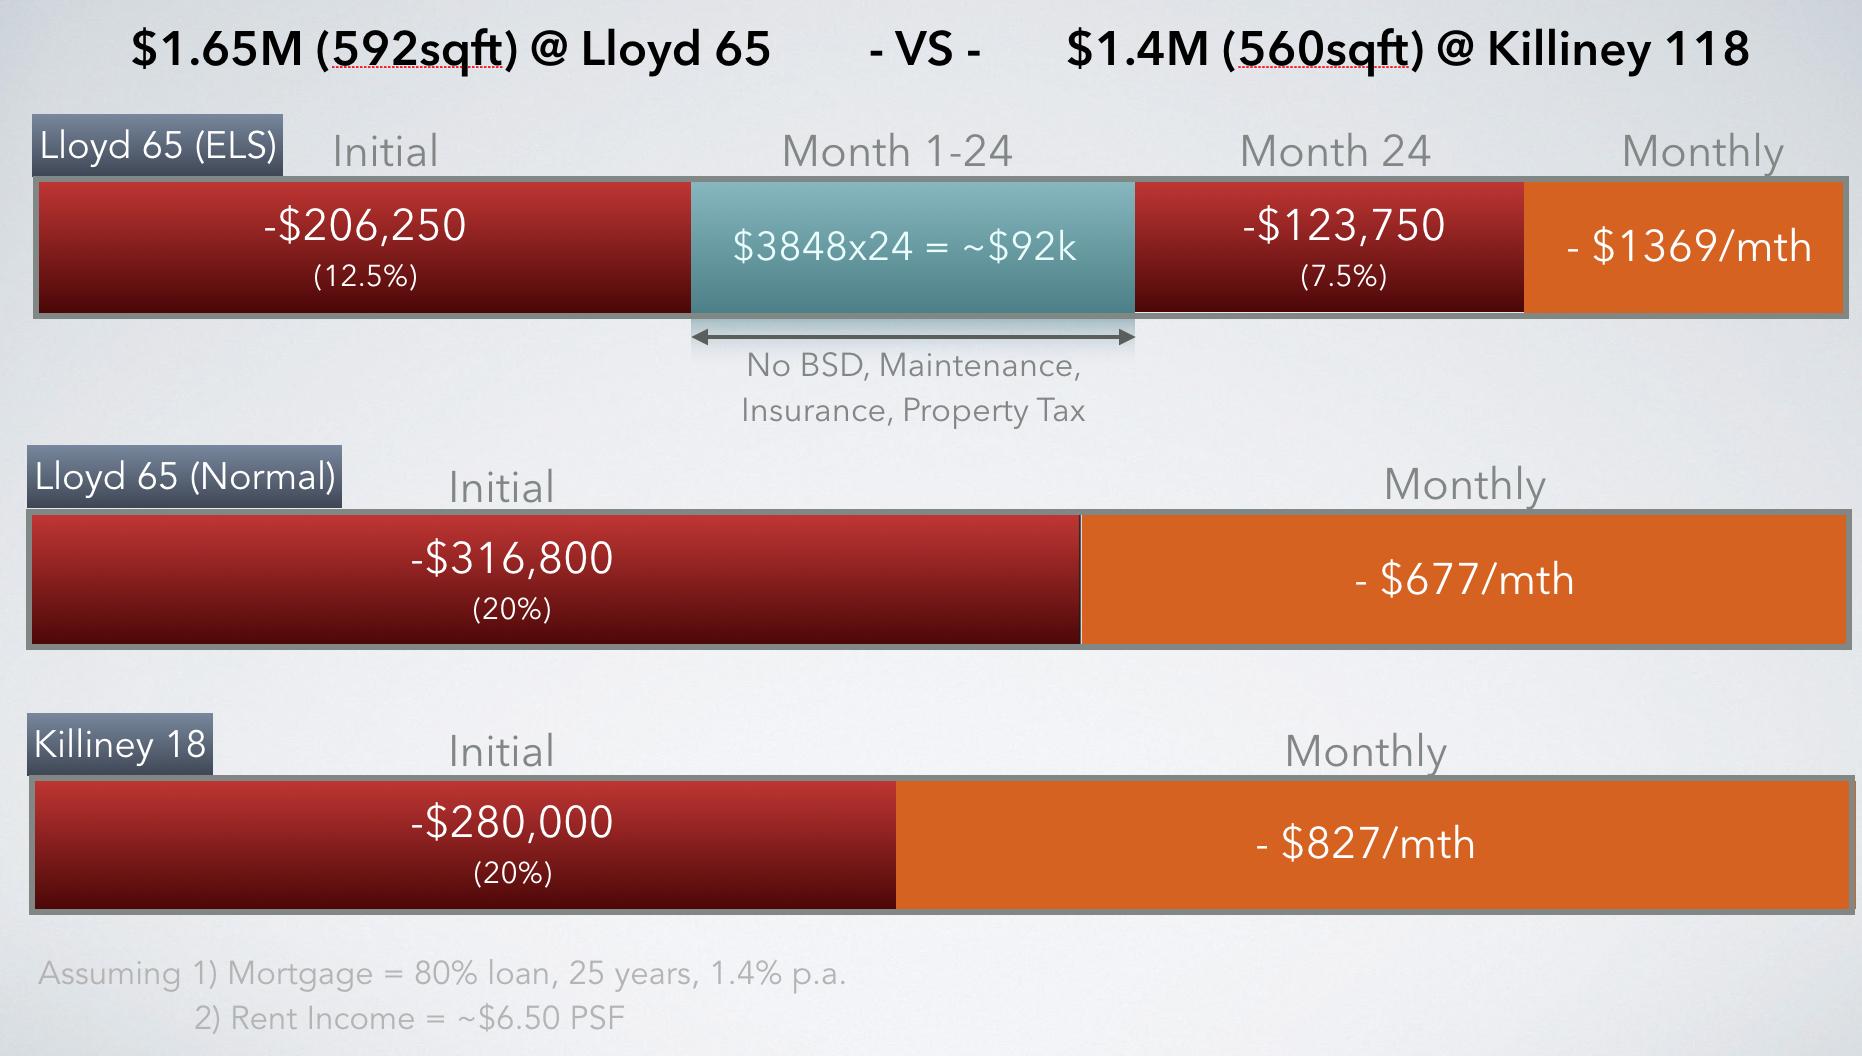 Lloyd 65 Experiential Leasing Scheme Comparison